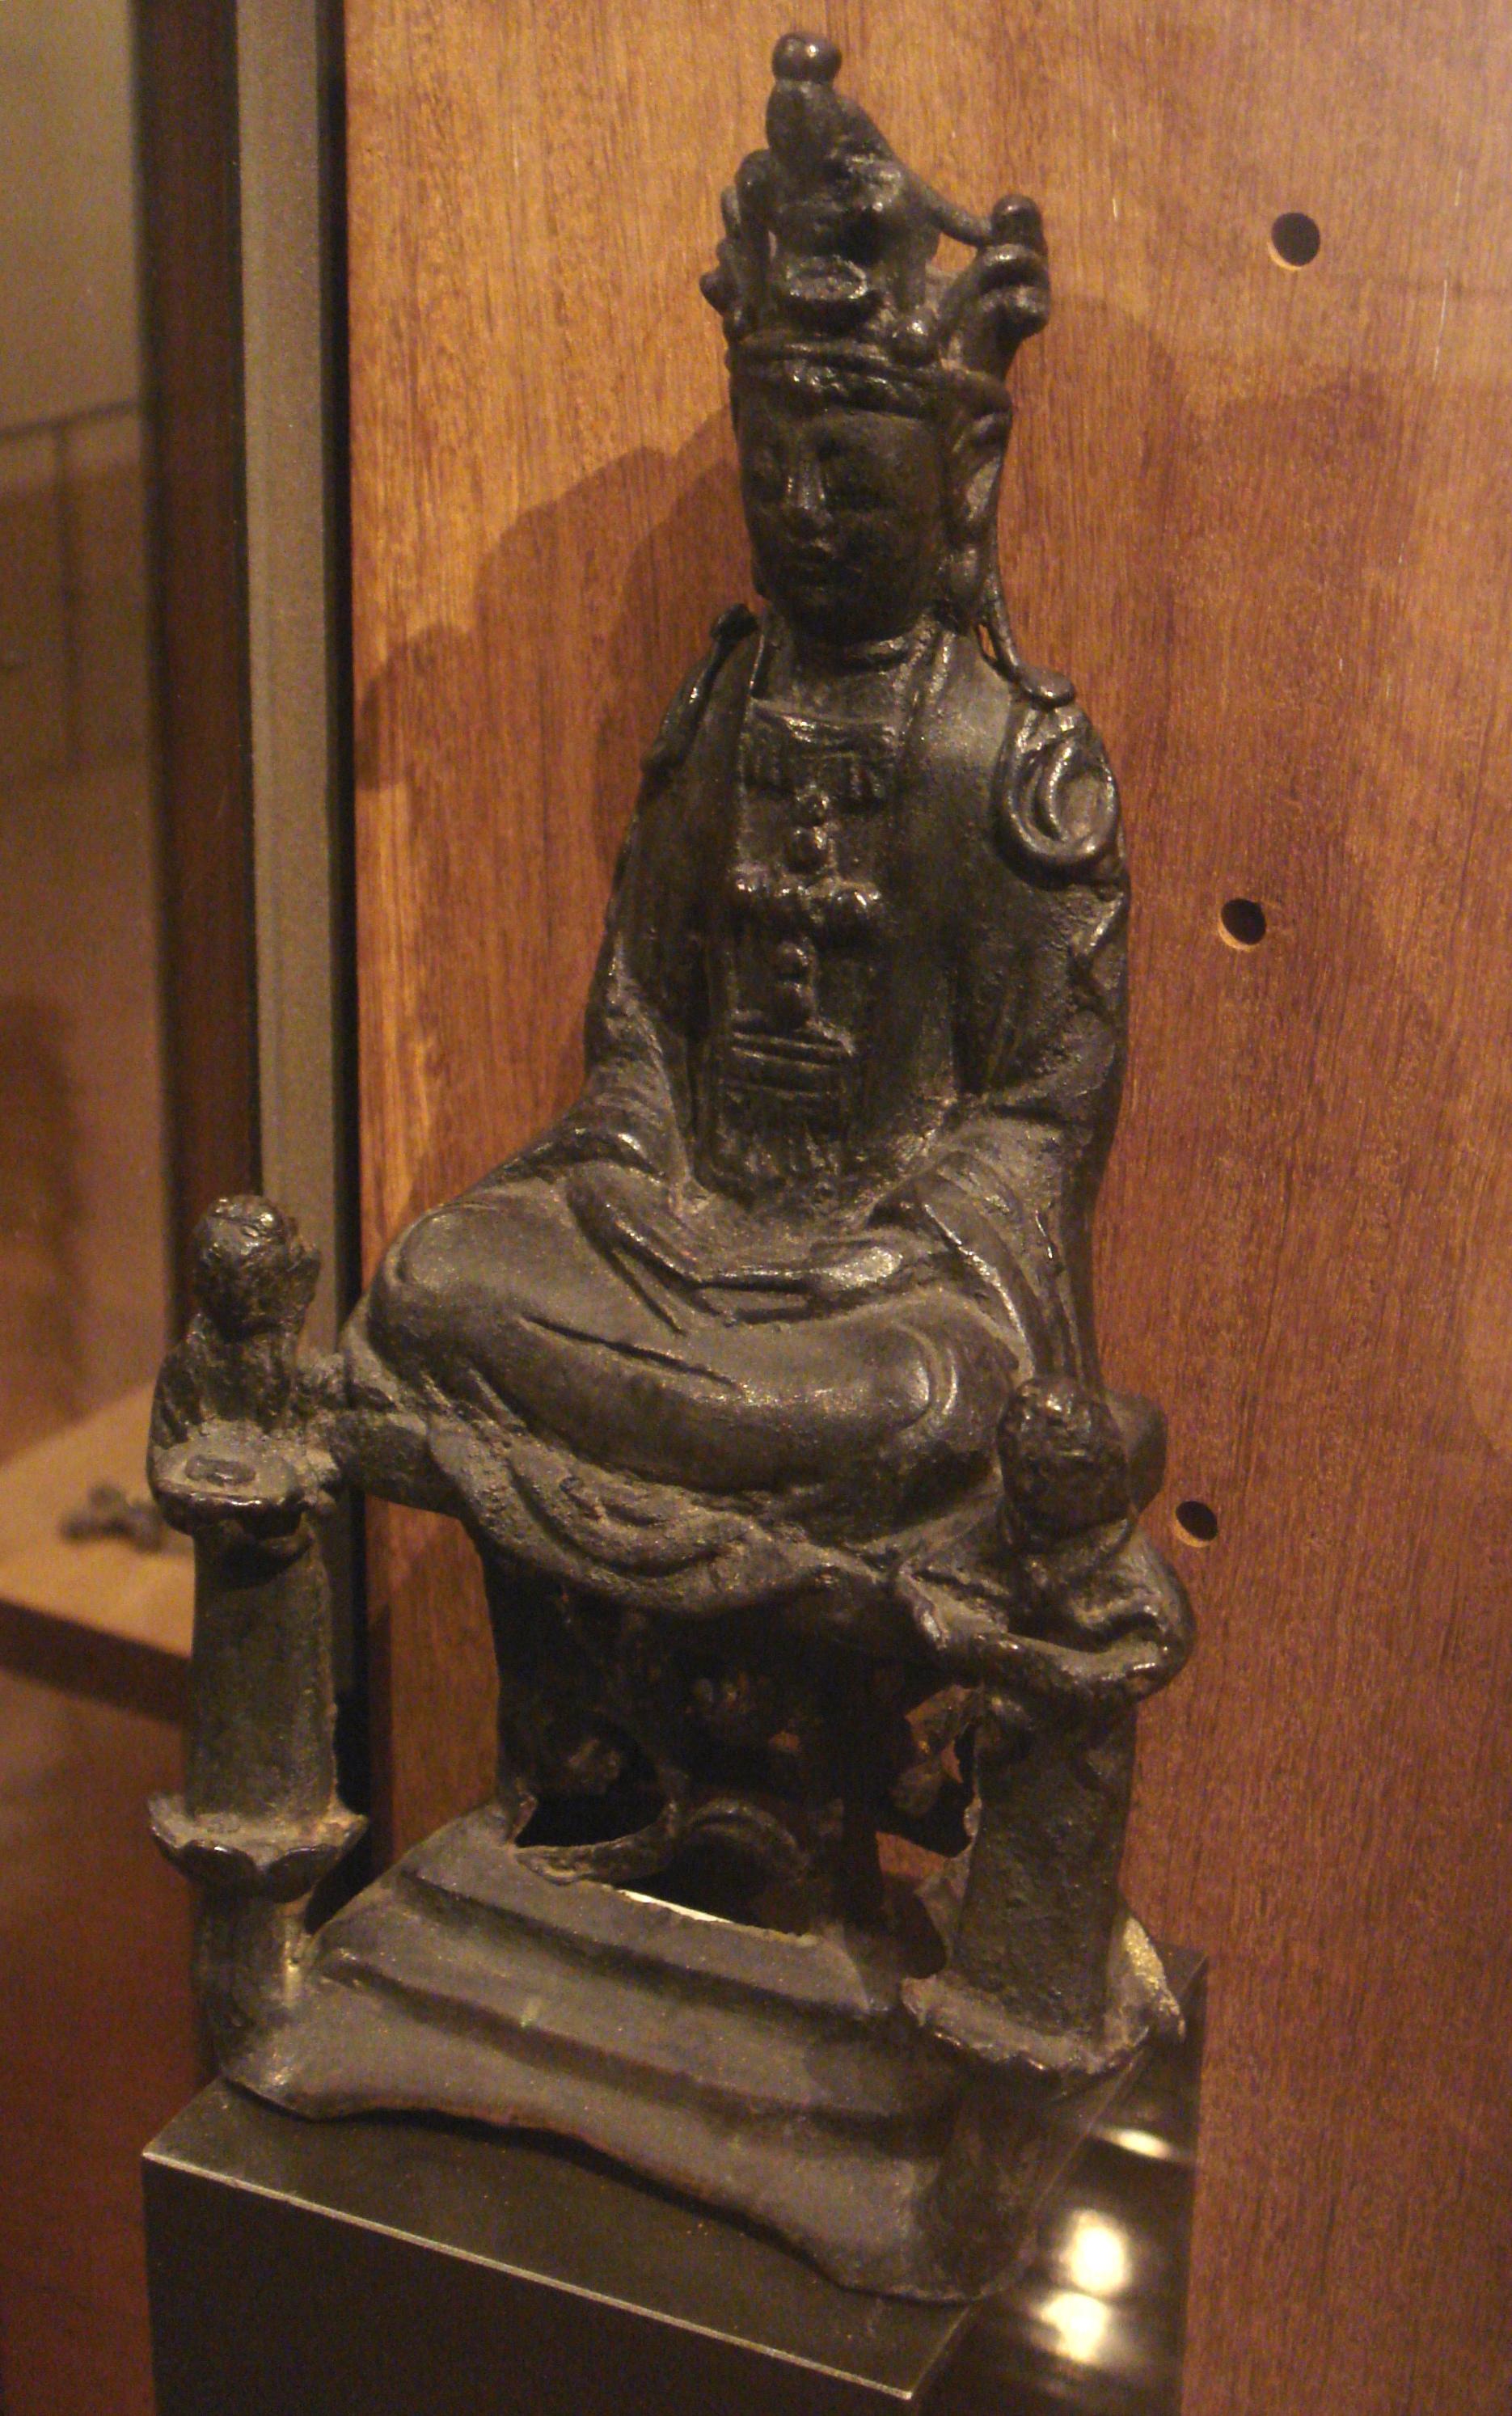 Marienfigur getarnt als Bodhisattva Kannon. (Quelle: PHGCOM via Wikimedia Commons unter Lizenz CC-BY-SA 3.0)